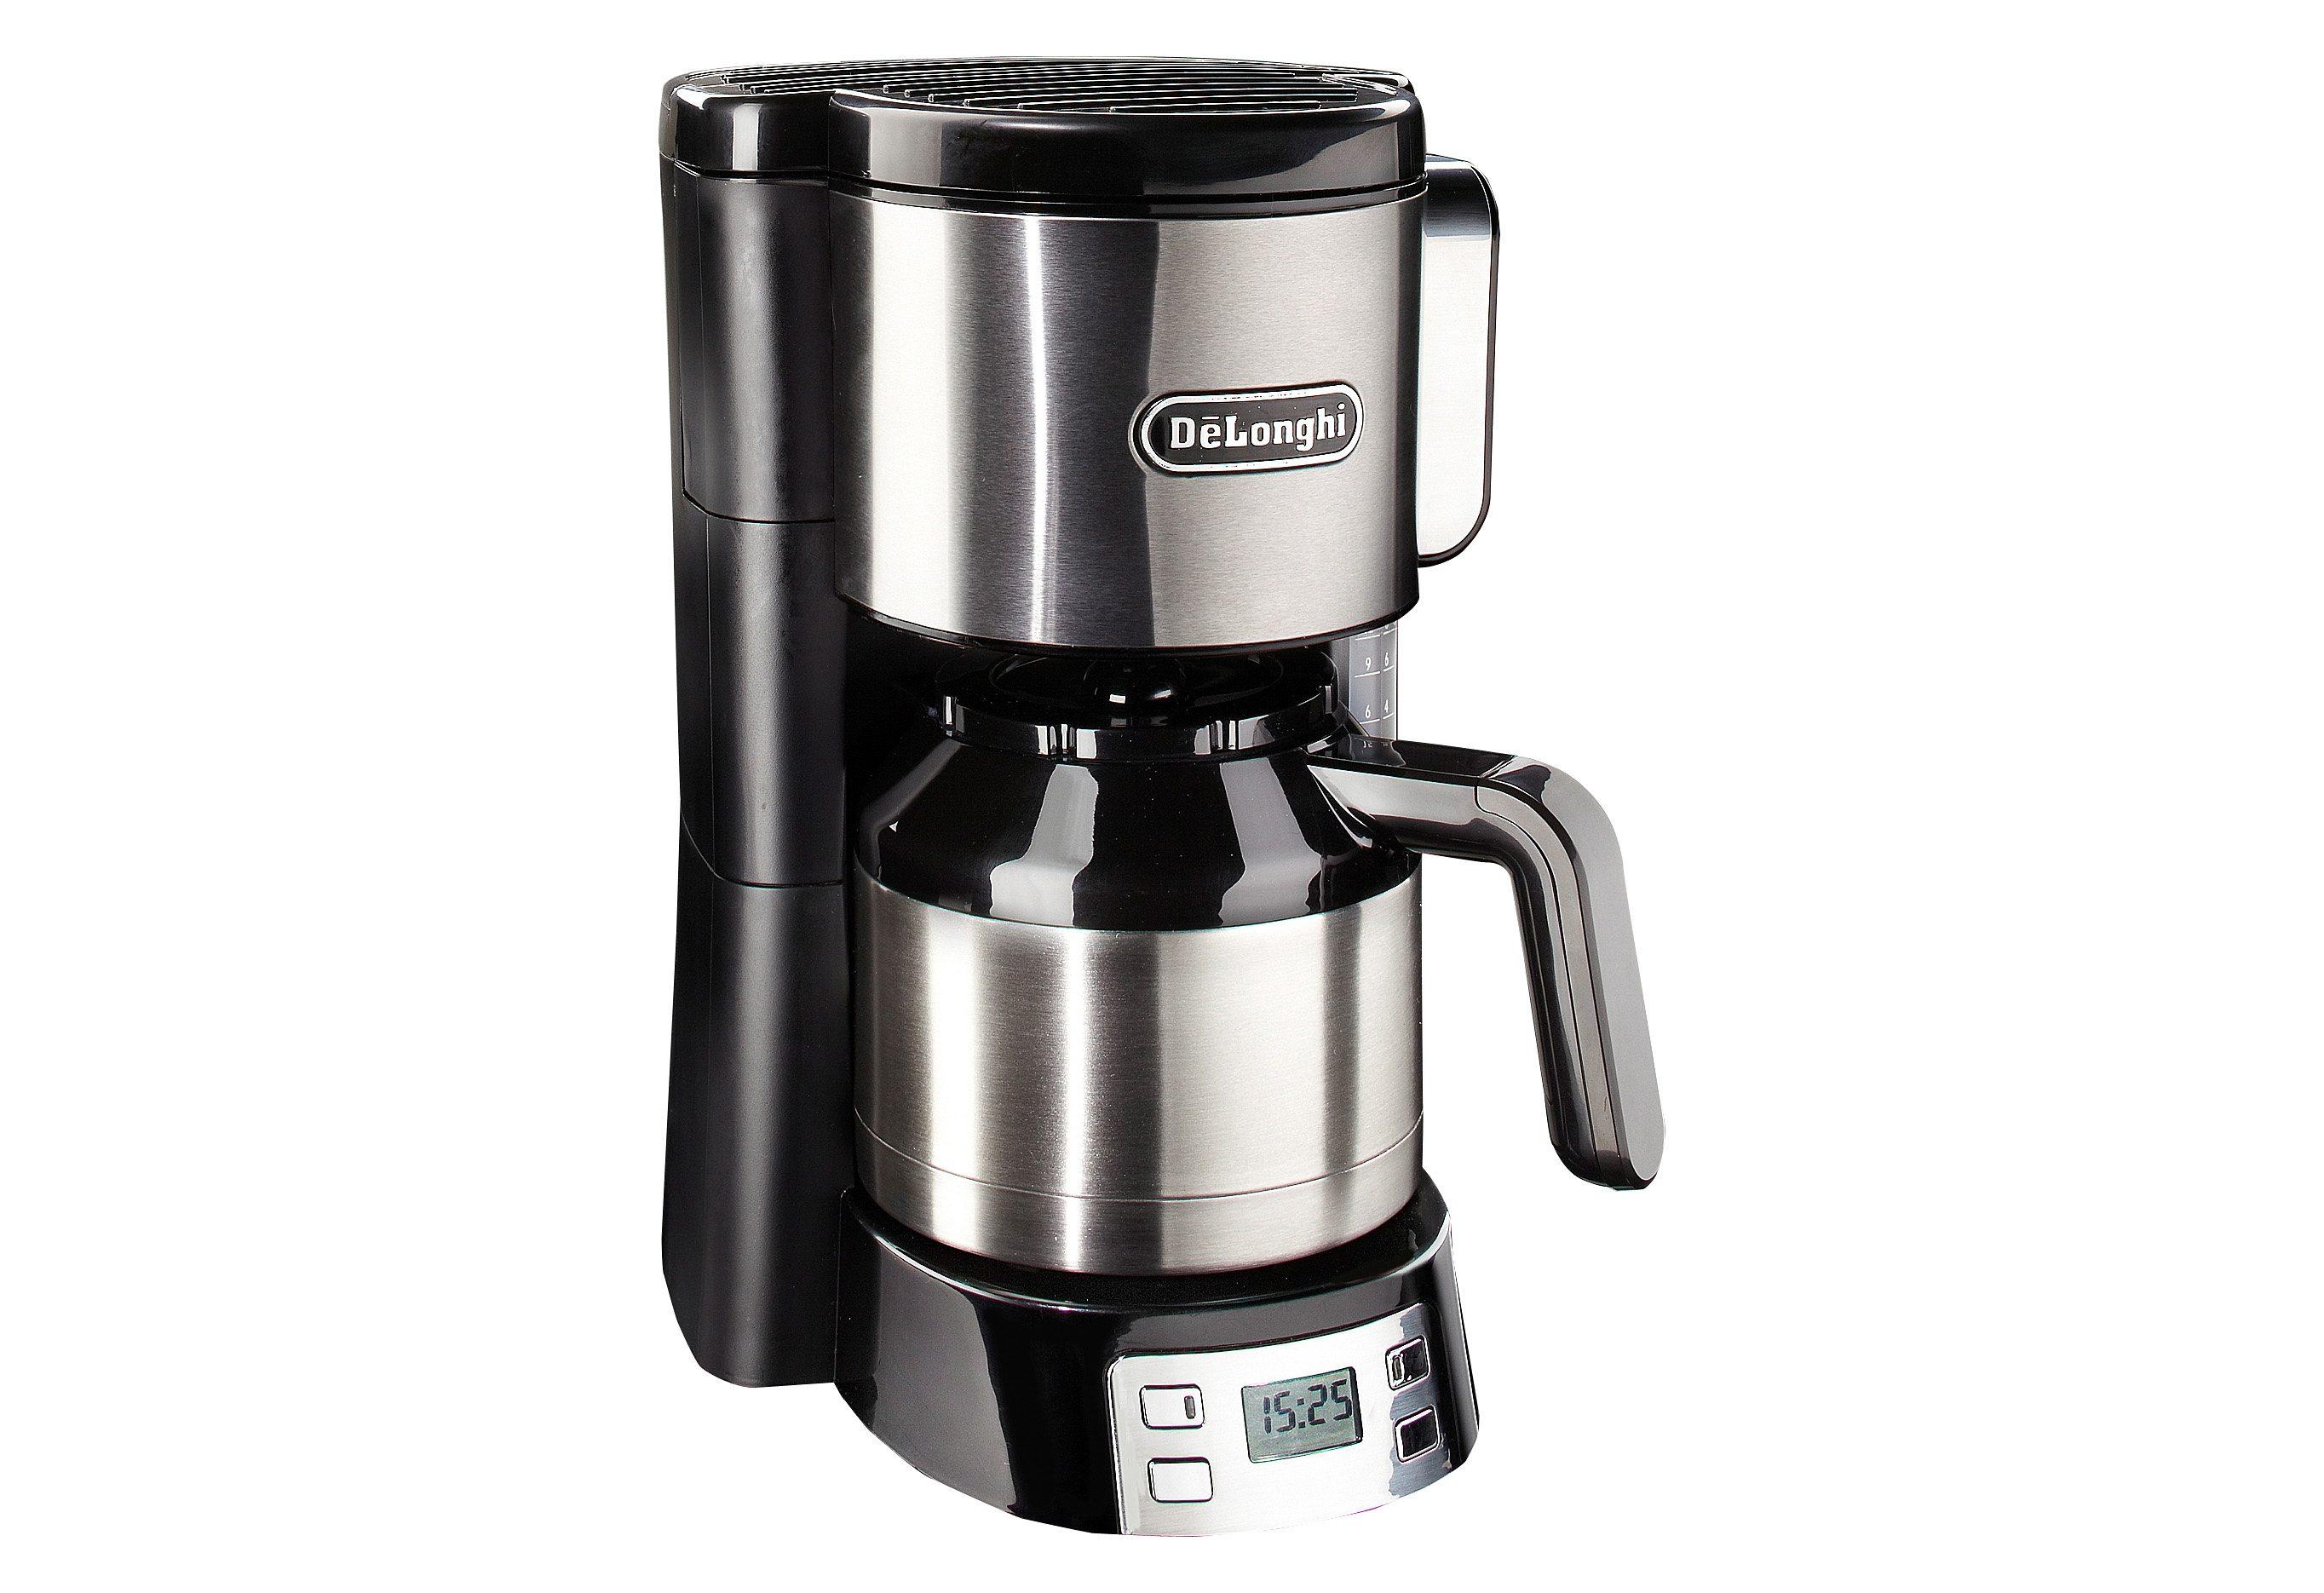 De´Longhi Kaffeemaschine »ICM15750«, mit 1,25 L Thermokanne, Abschaltautomatik, 1000 Watt